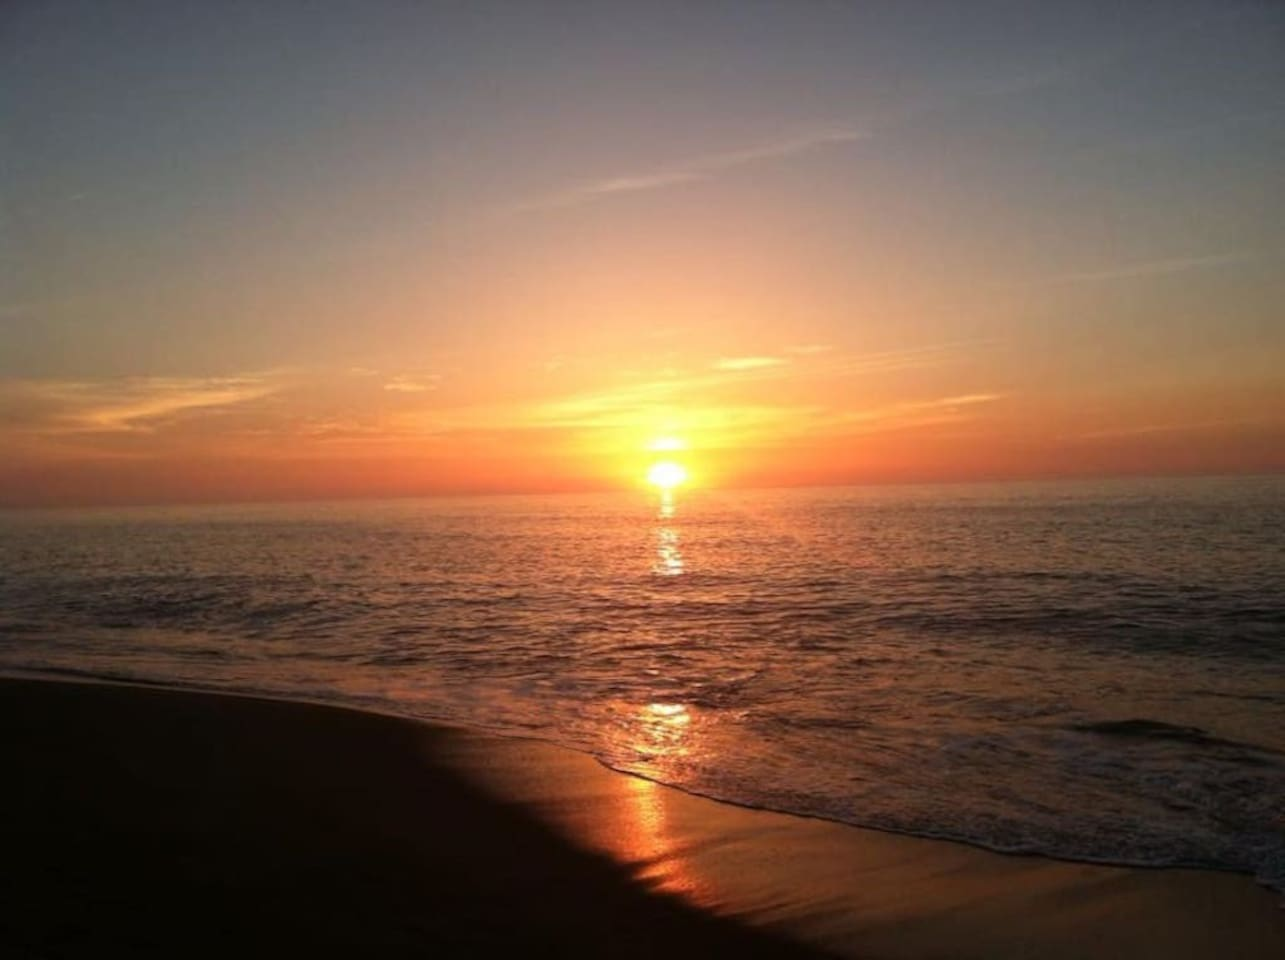 Plum Island ocean sunrise